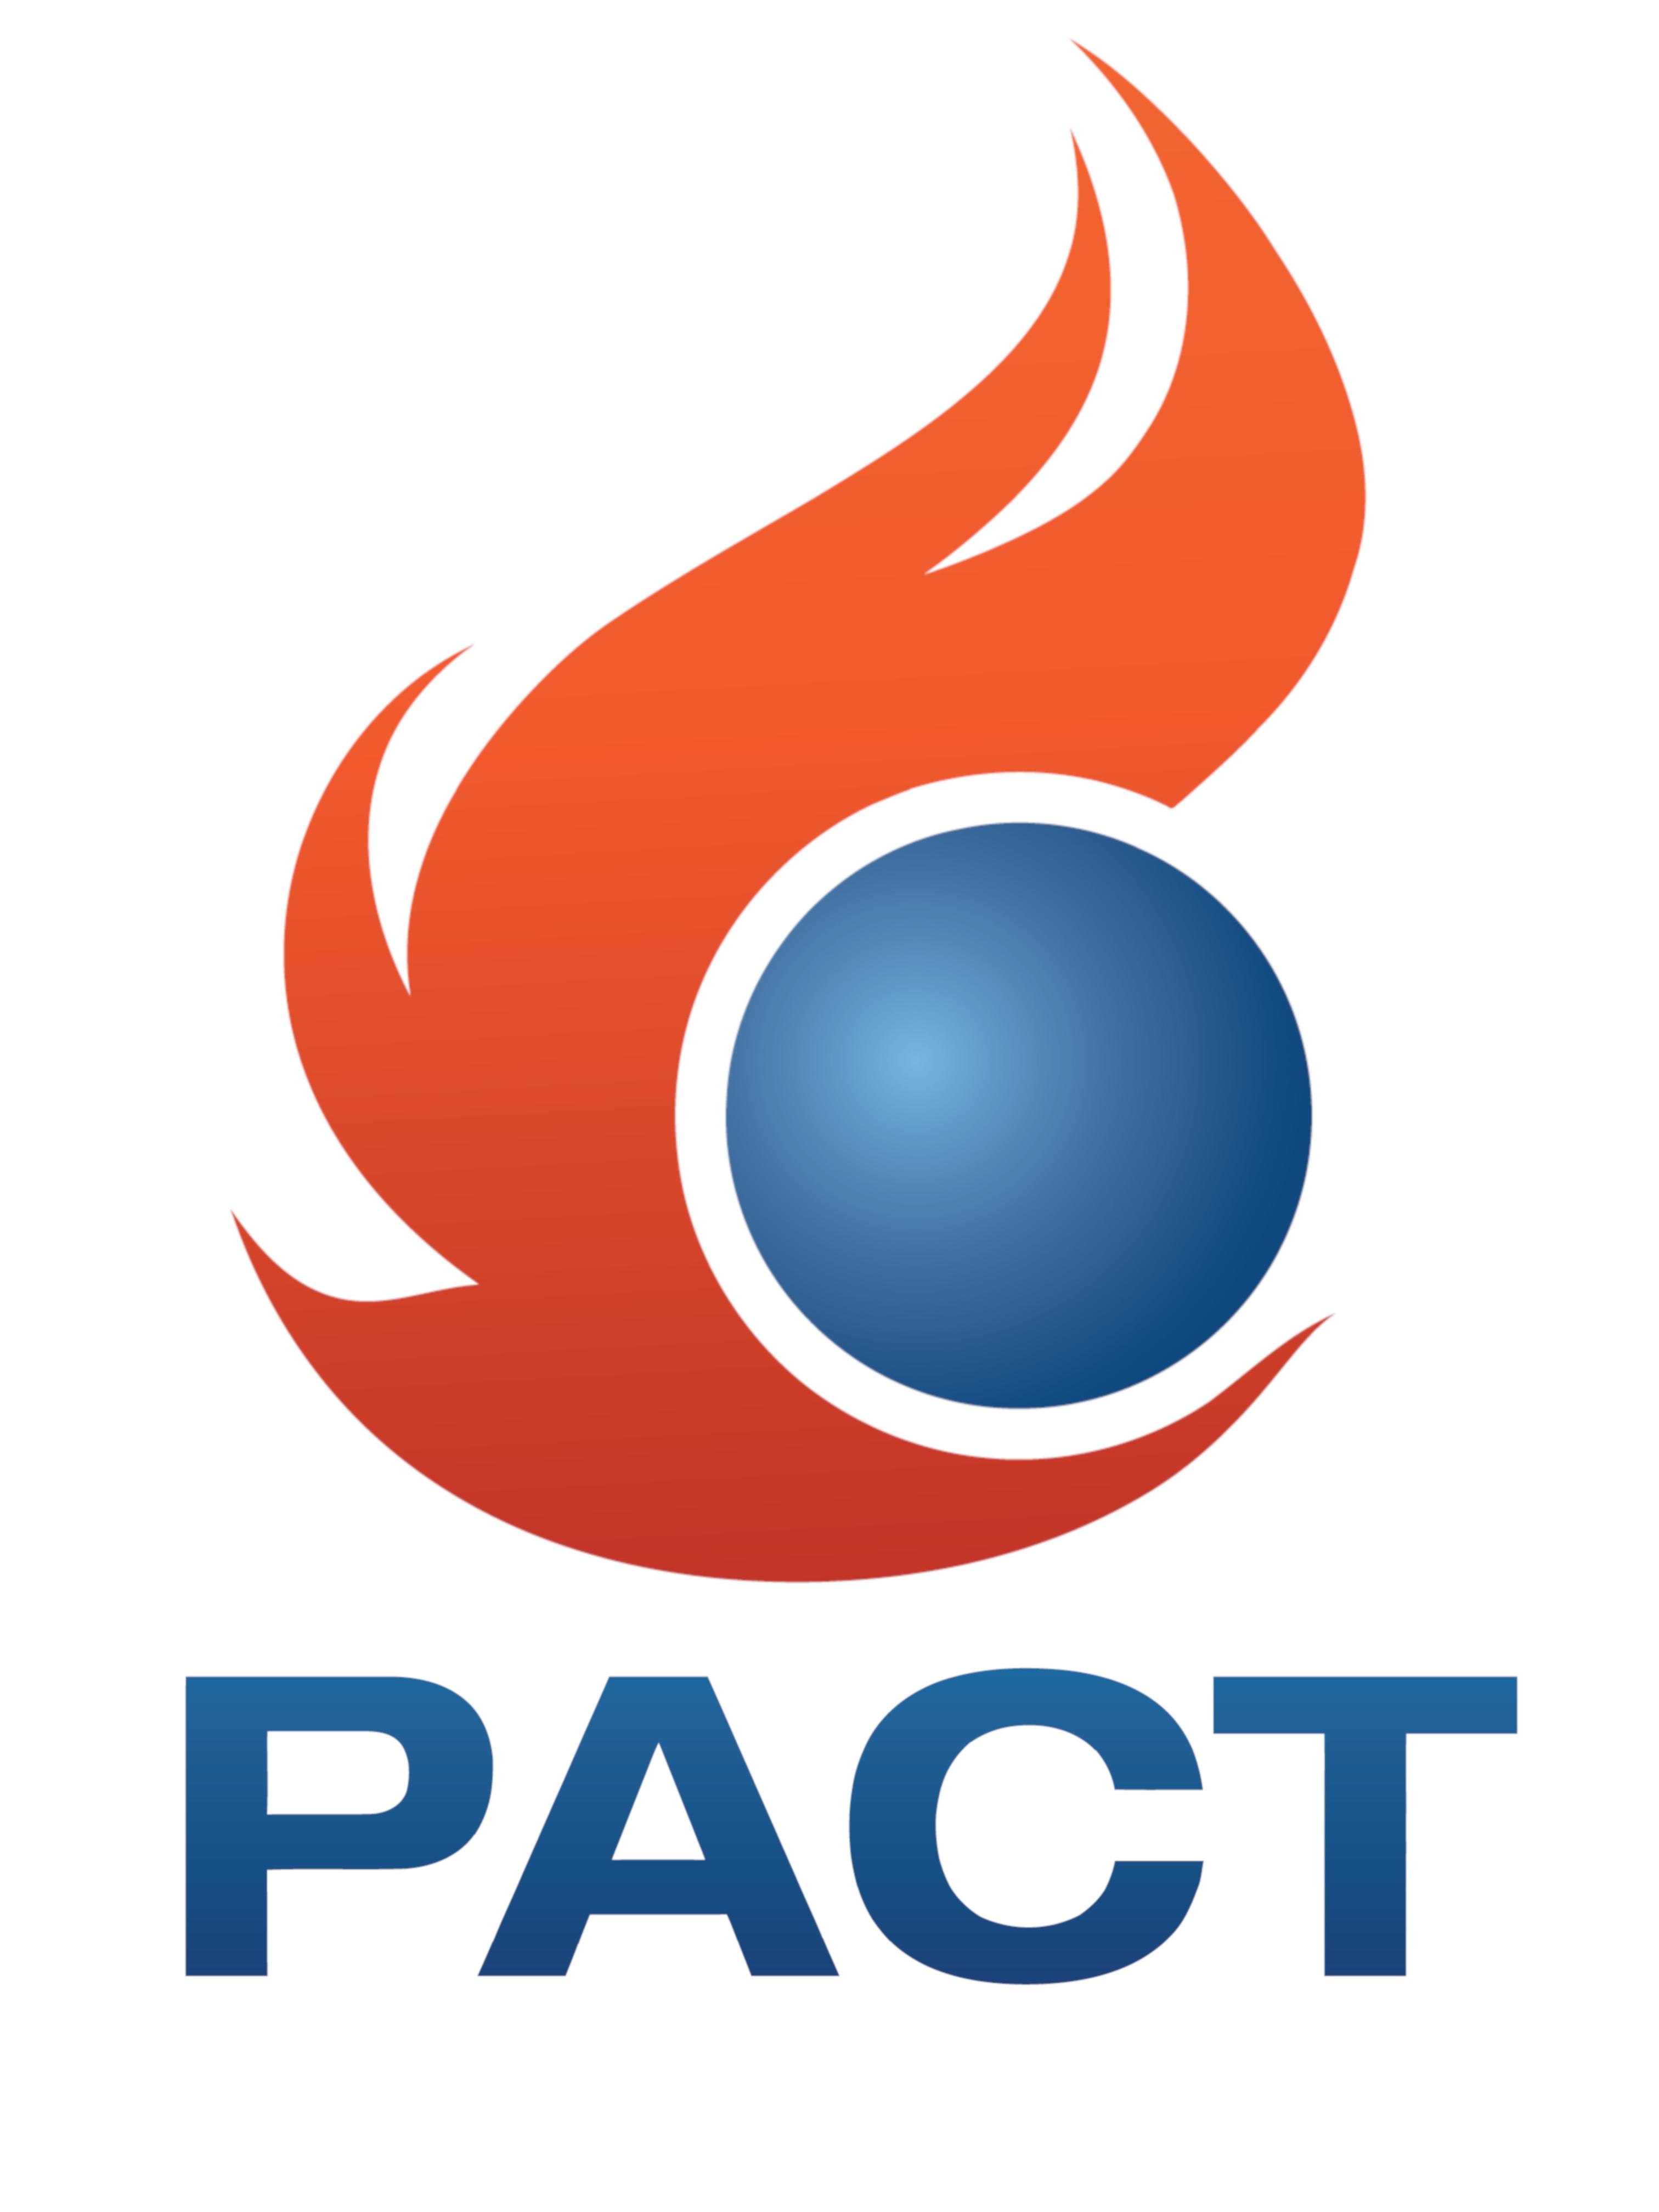 https://pactair.com.au/wp-content/uploads/2019/09/pactplaceholder.jpg